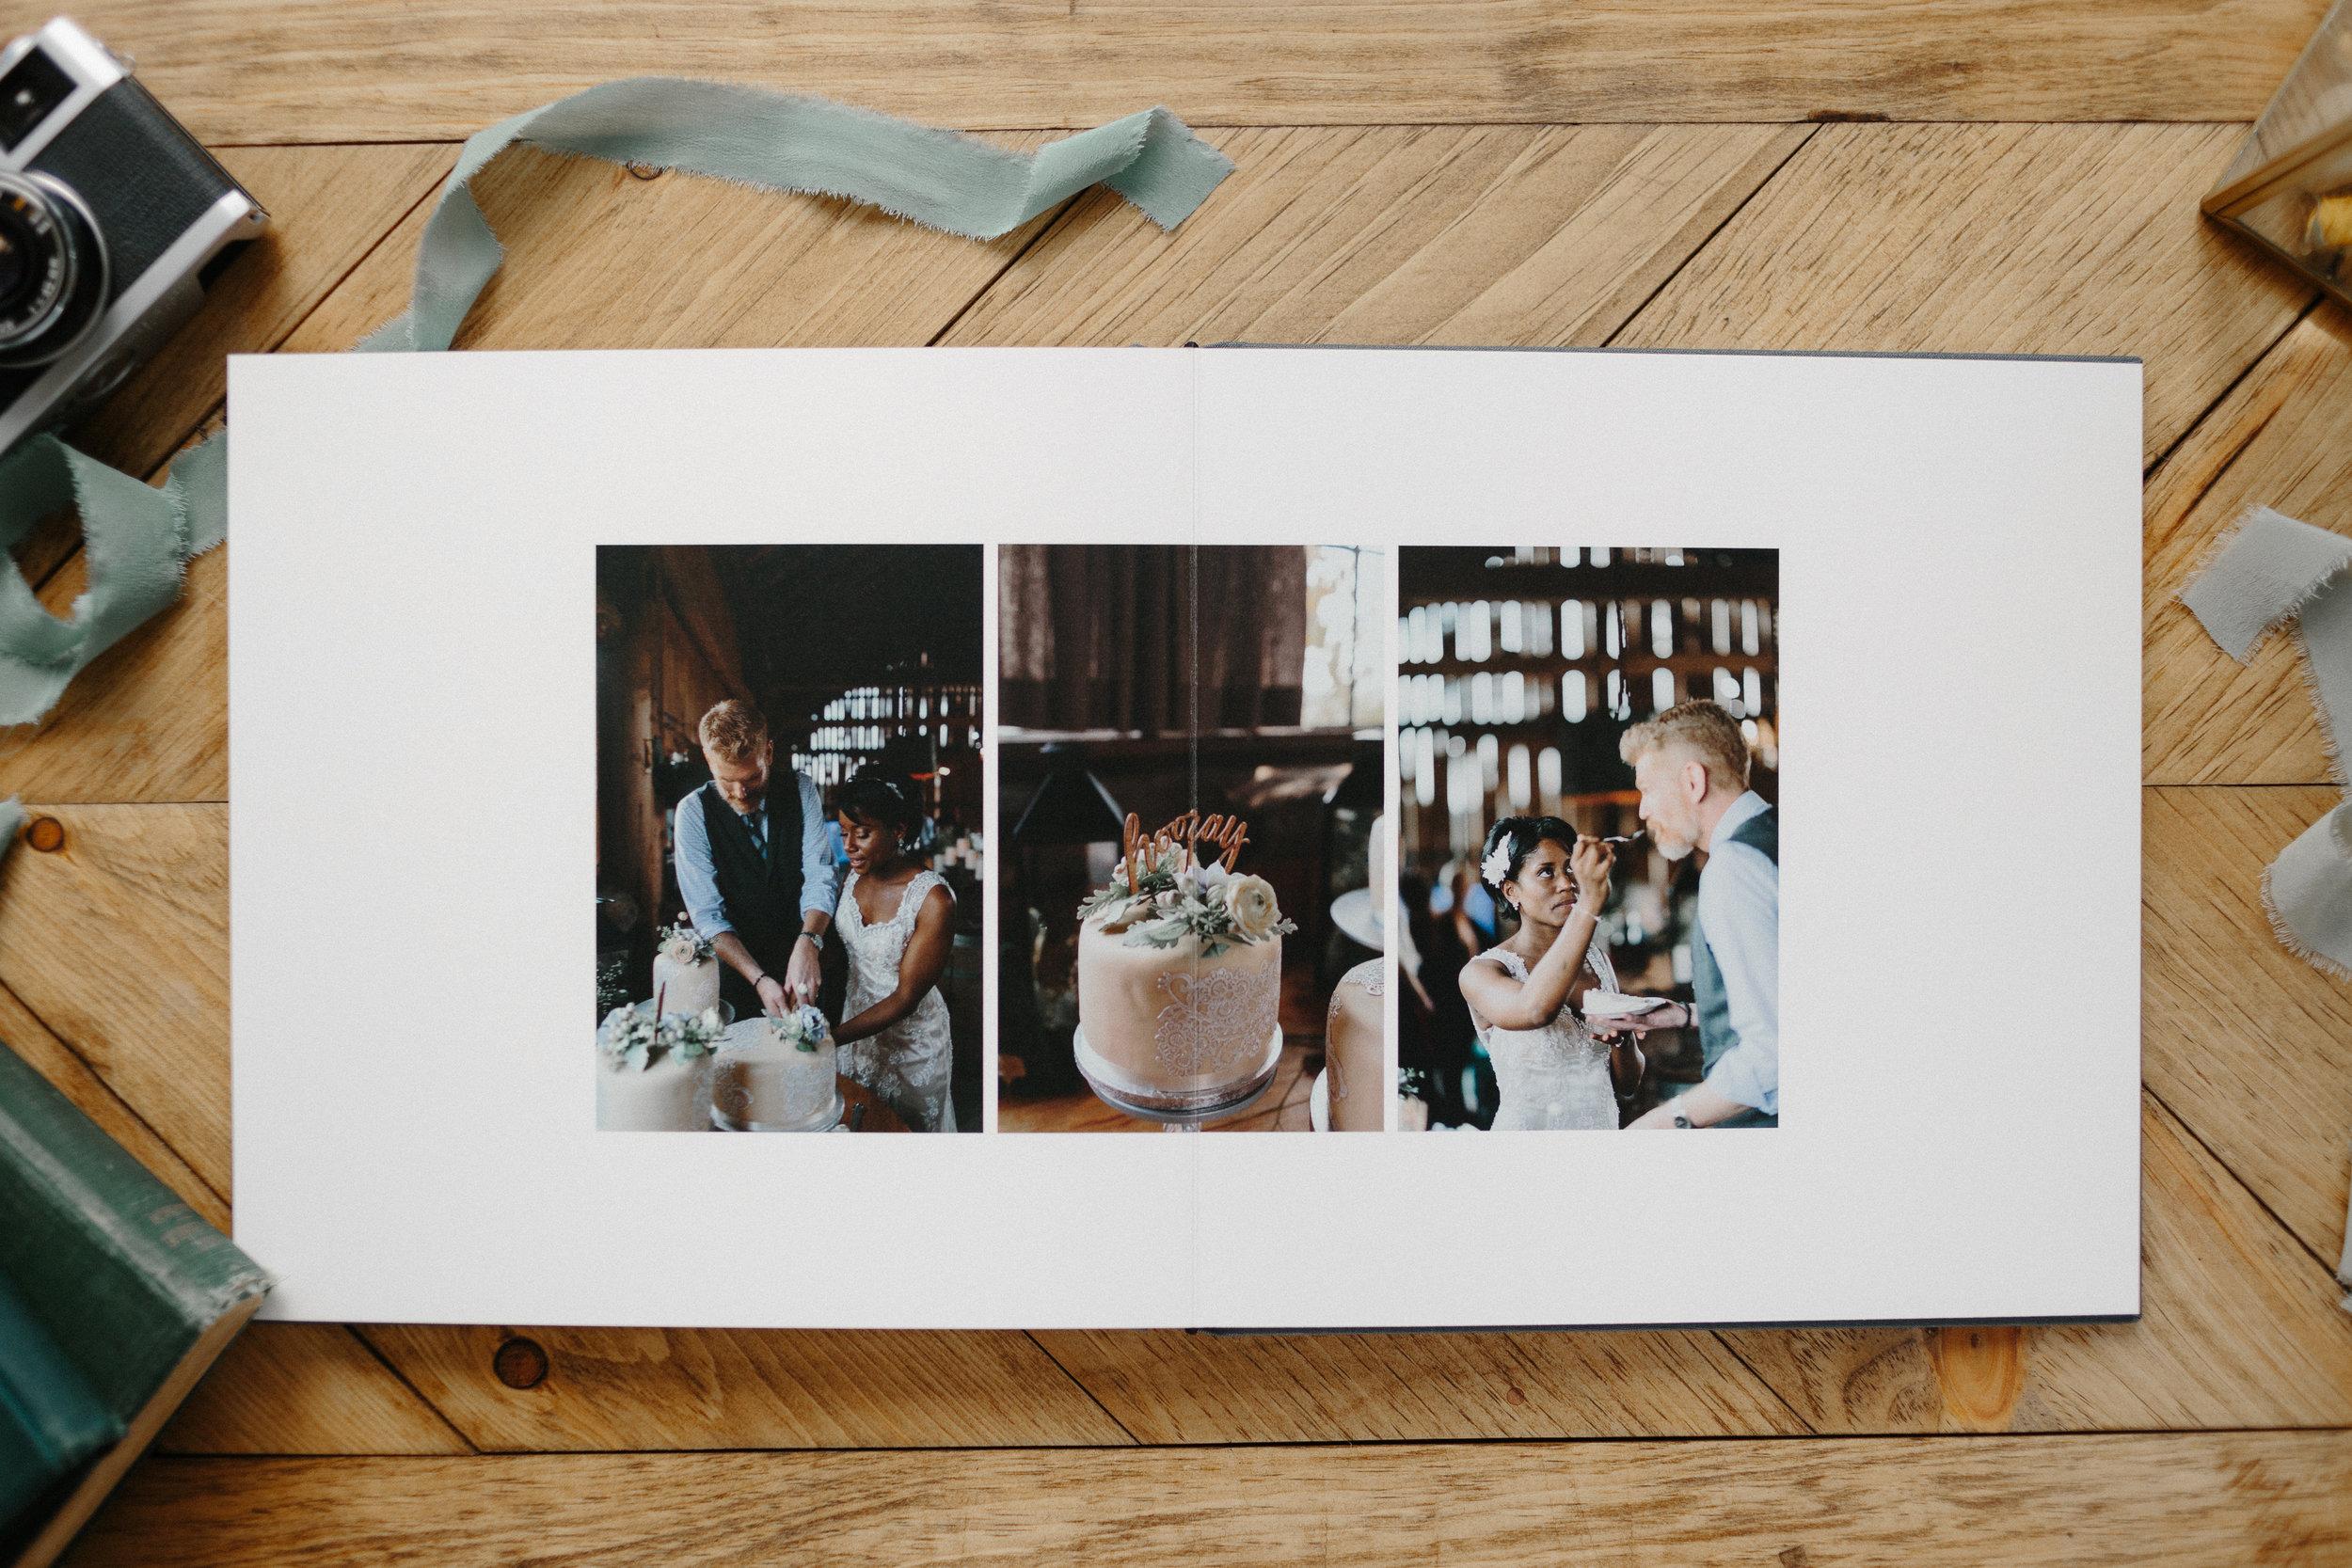 ryanne-hollies-photography-wedding-album-design-details-tono-and-co-artifact-uprising-68.jpg